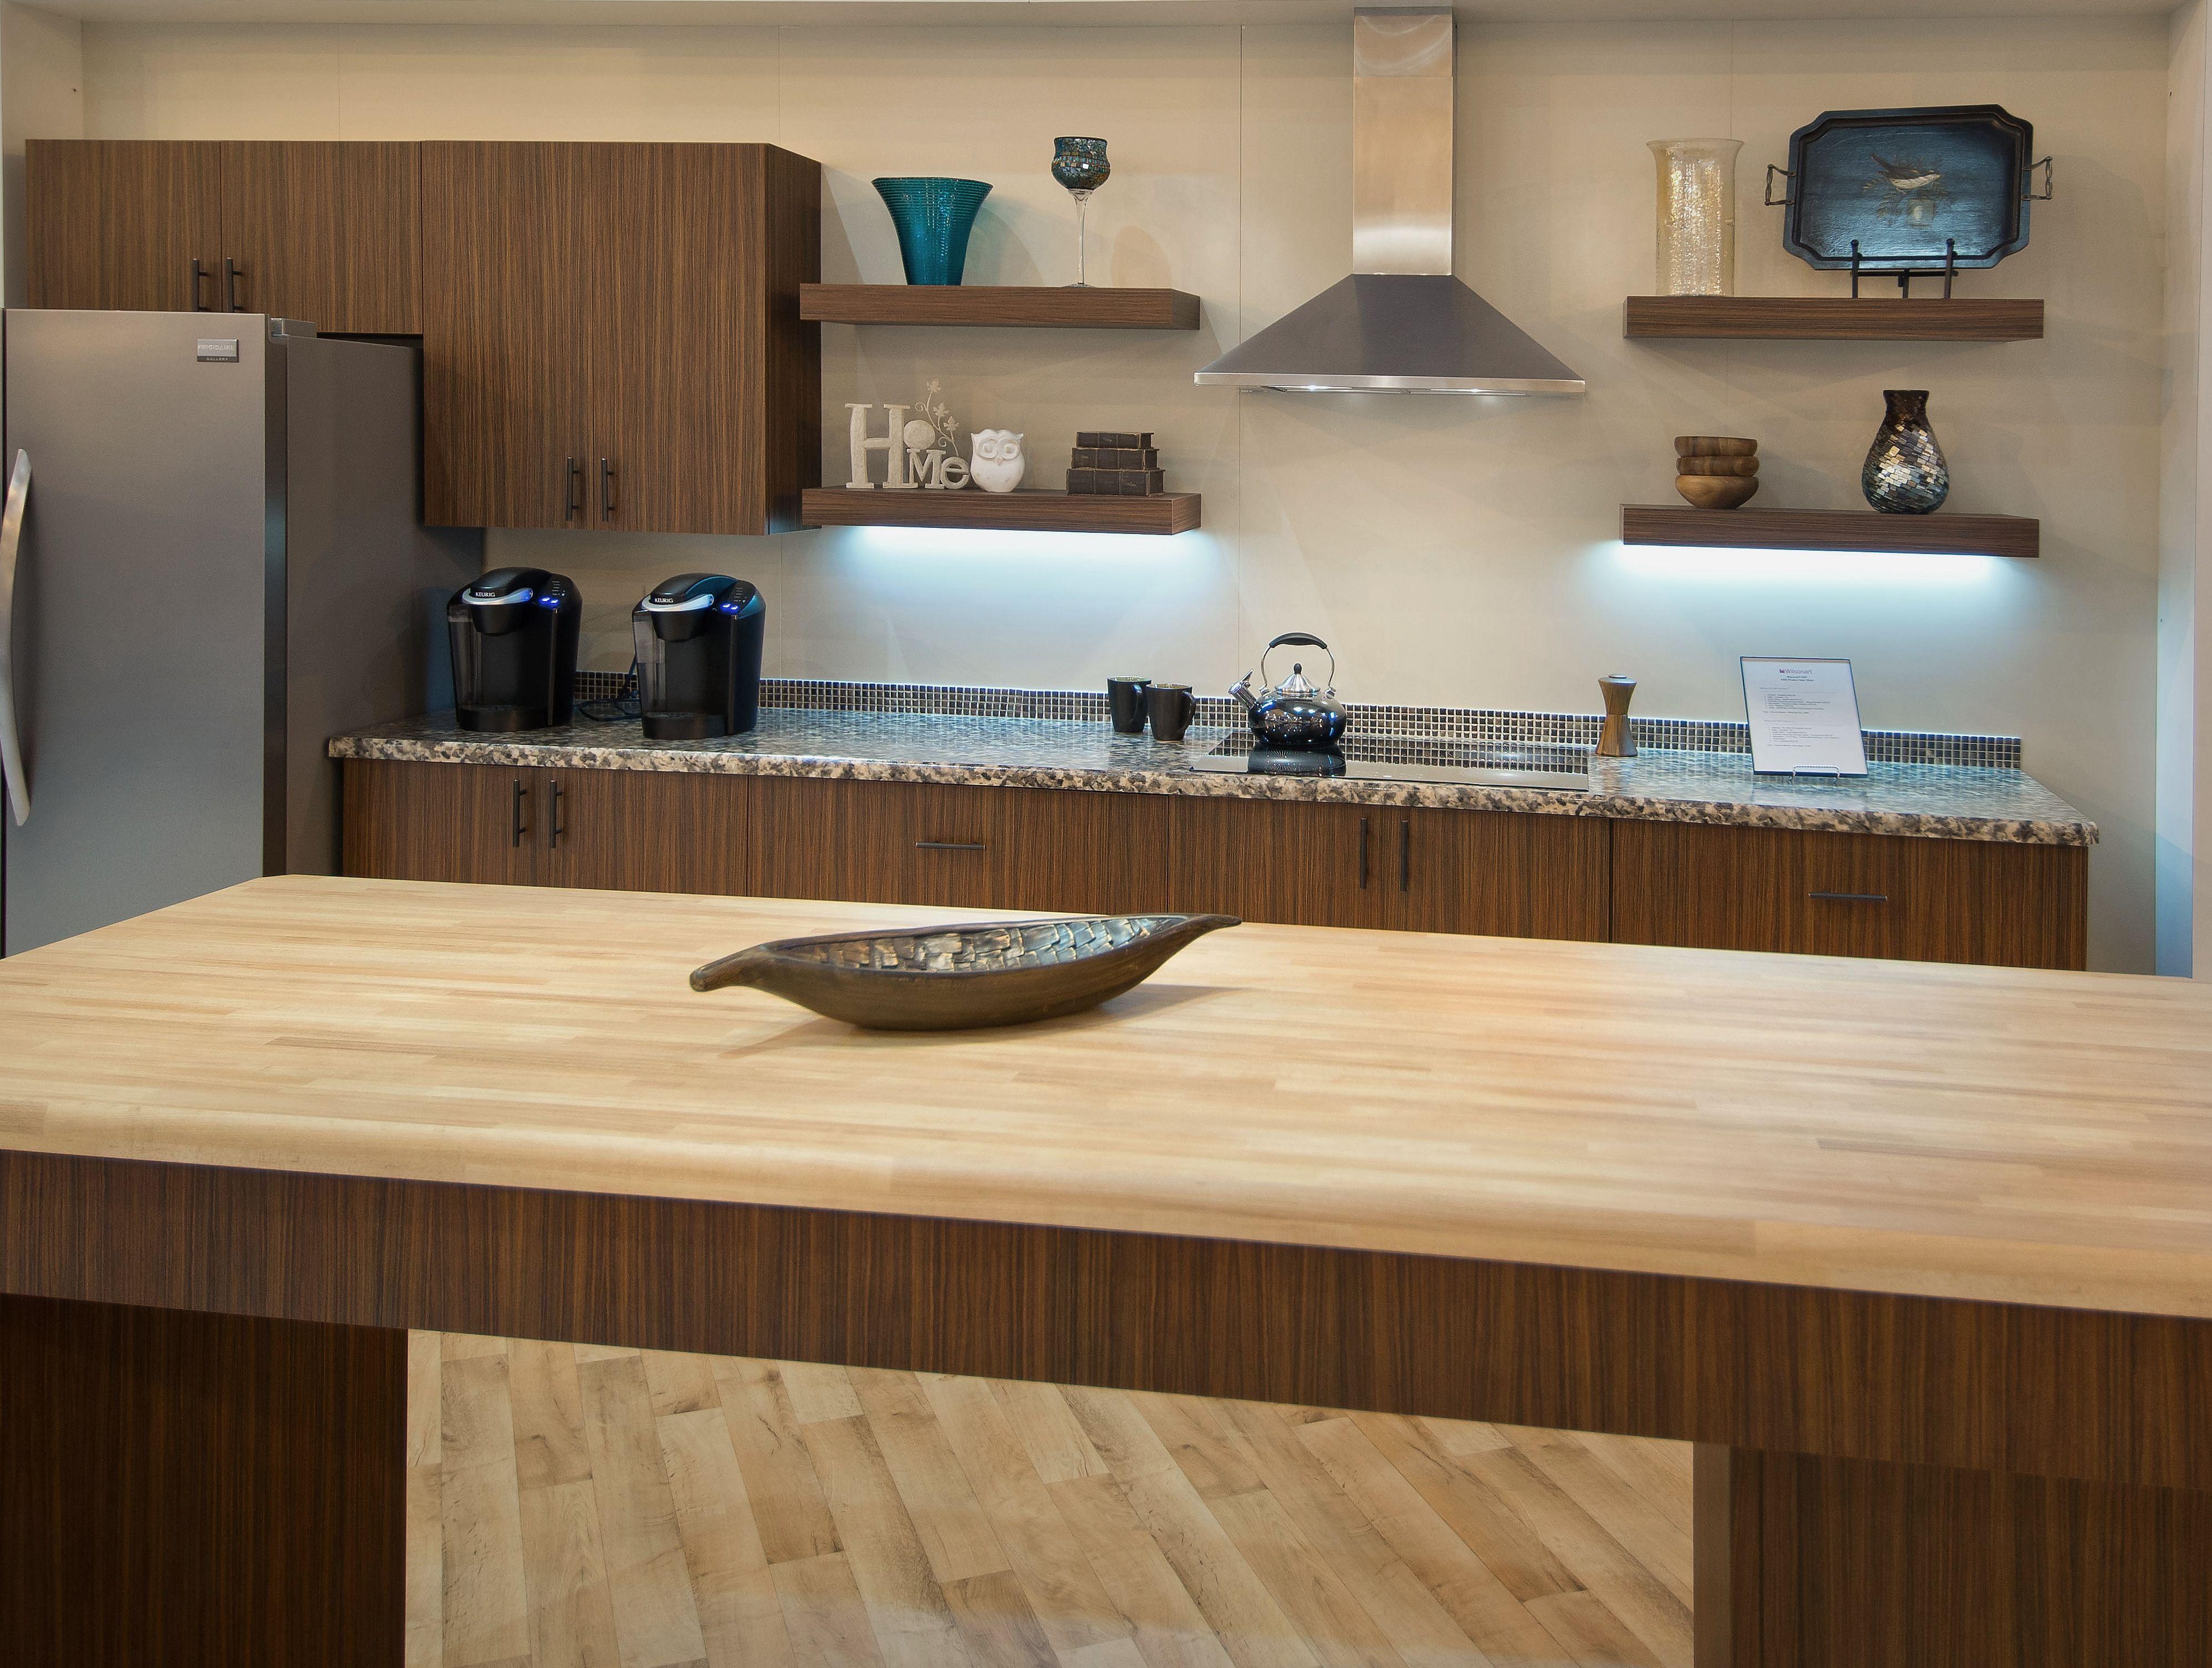 cheap kitchen countertop - Modern Kitchen Counter